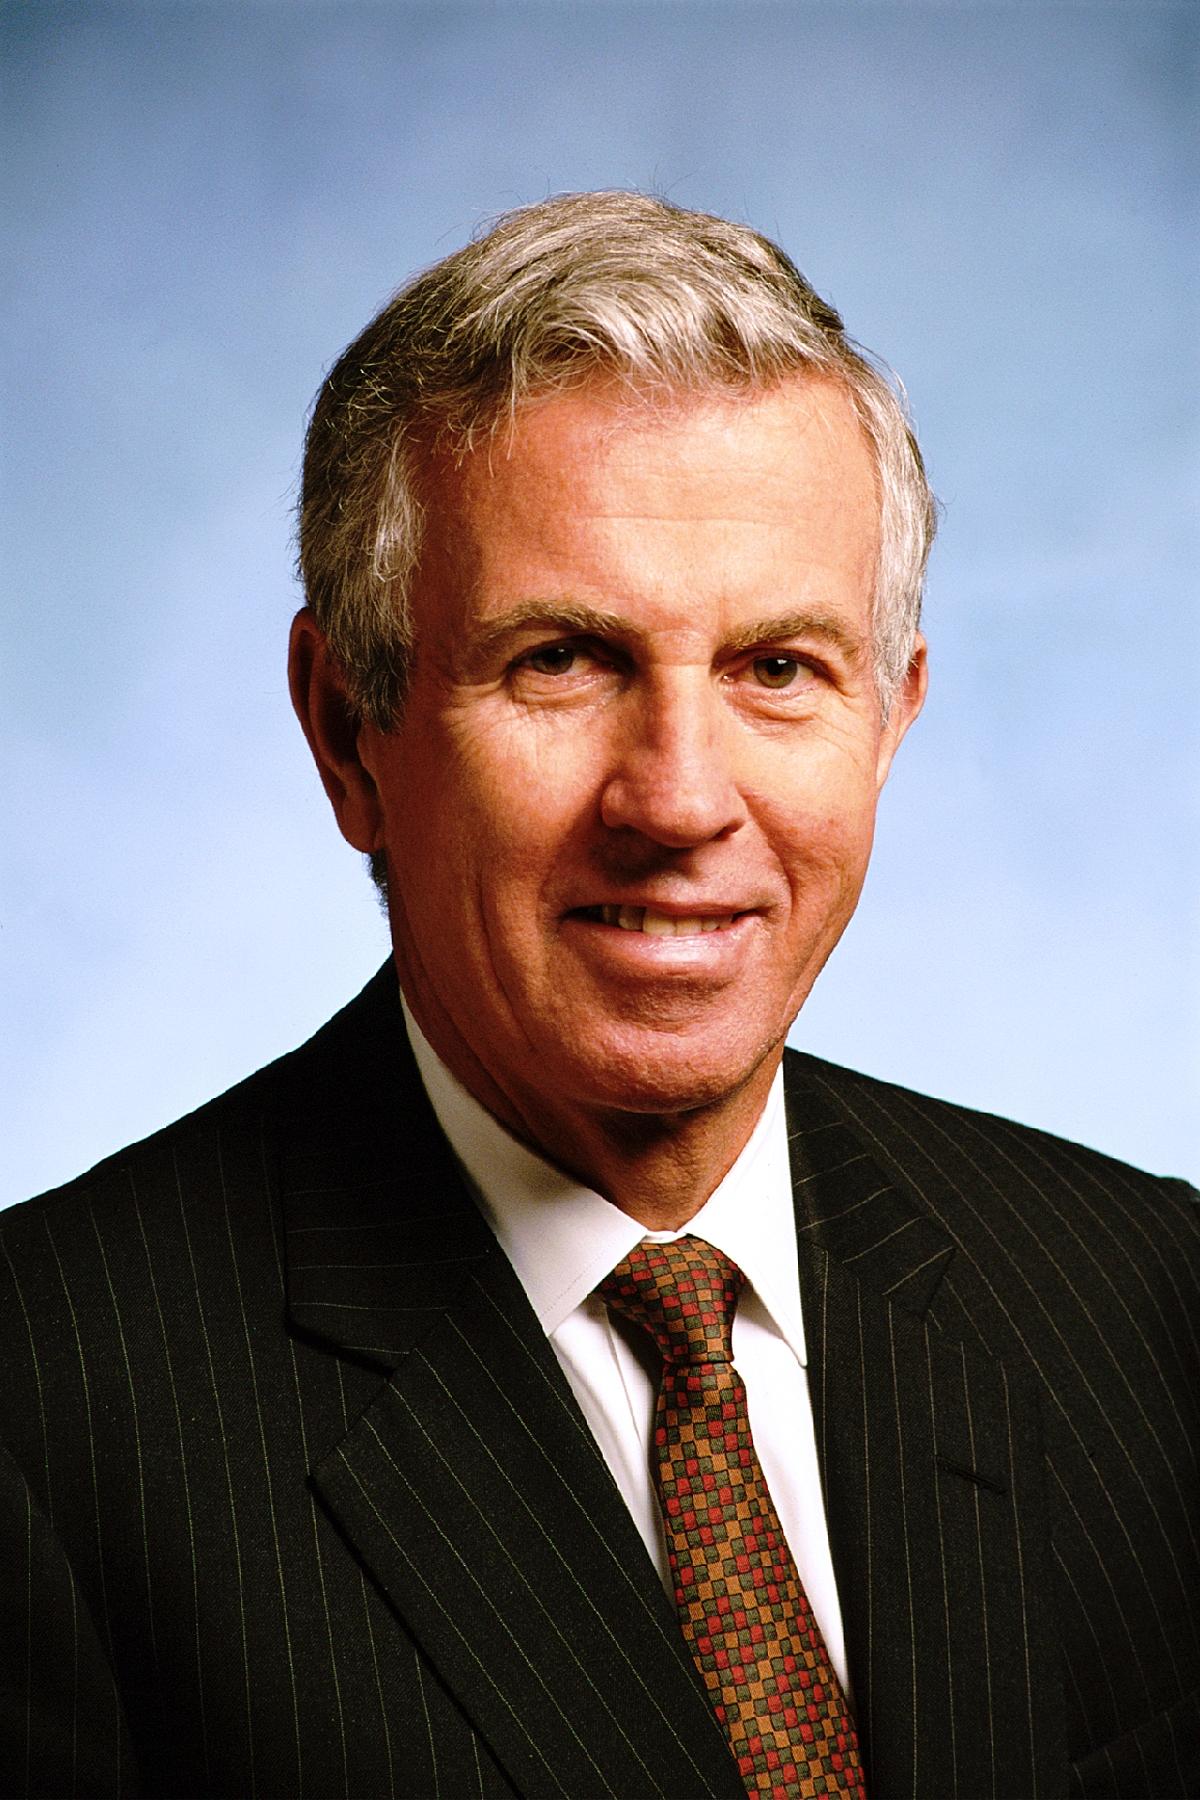 Richard Braddock, a former Priceline.com CEO, is chairman of social commerce startup Joinem.